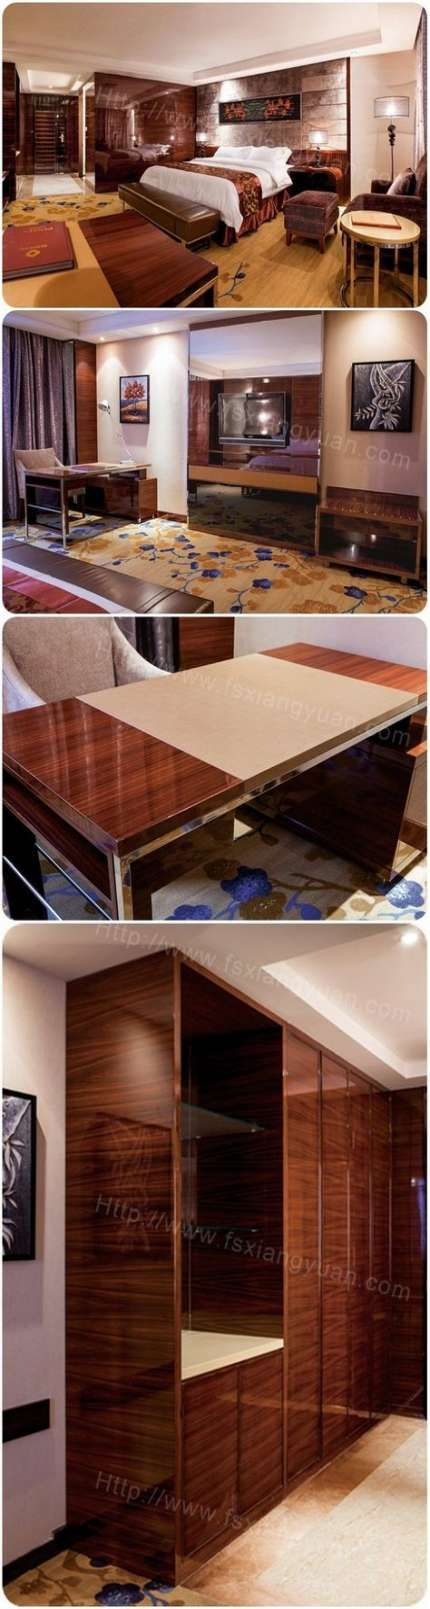 17+ Ideas For Pakistani Bedroom Furniture Designs ...